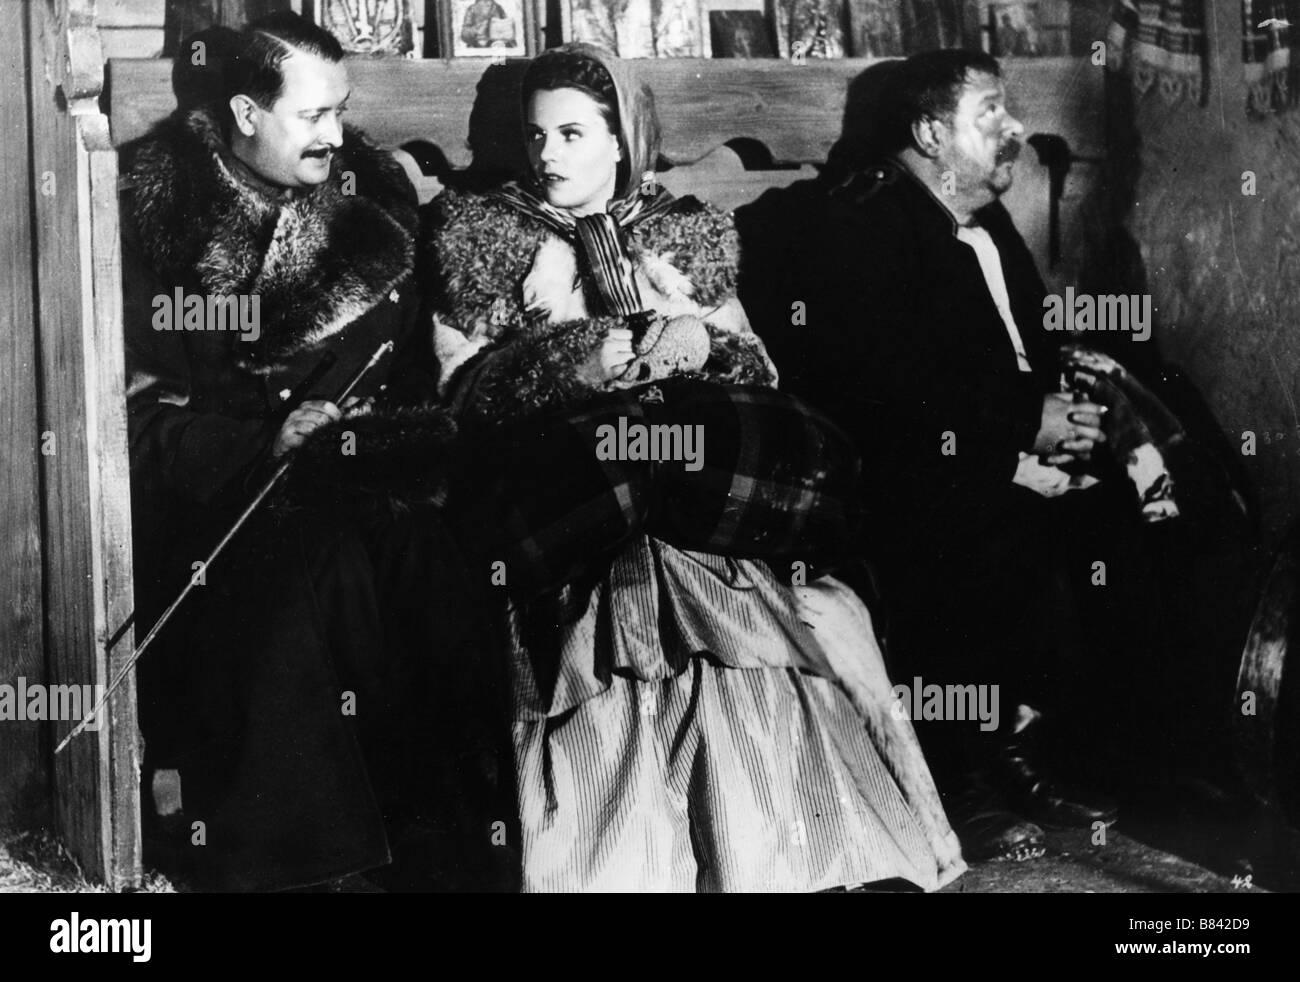 Der Postmeister The Stationmaster Year: 1940 - Germany Heinrich George, Hilde Krahl, Siegfried Breuer  Director: - Stock Image